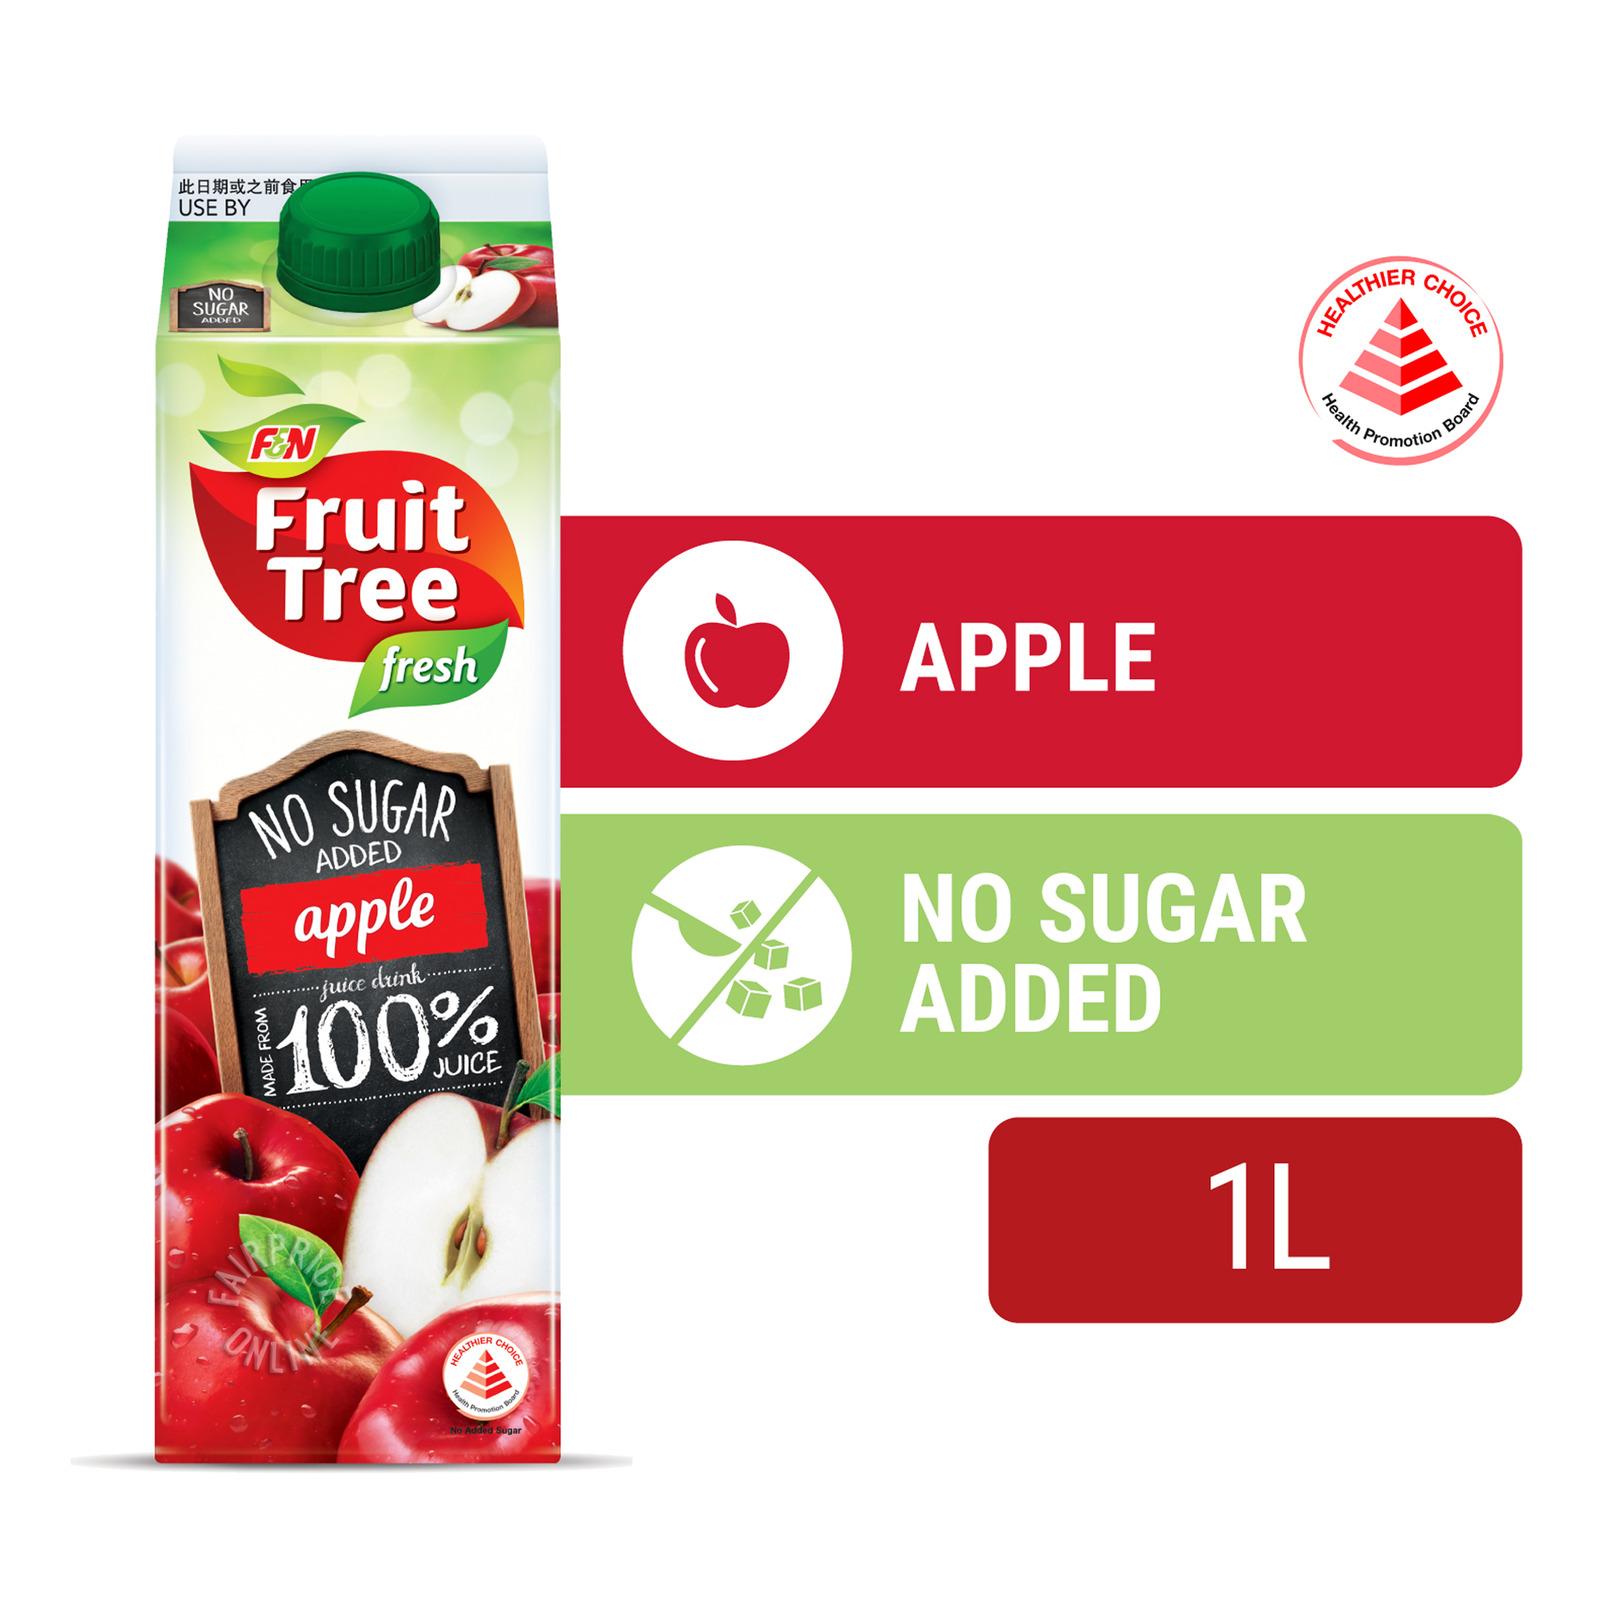 F&N Fruit Tree Fresh No Sugar Added Juice - Apple